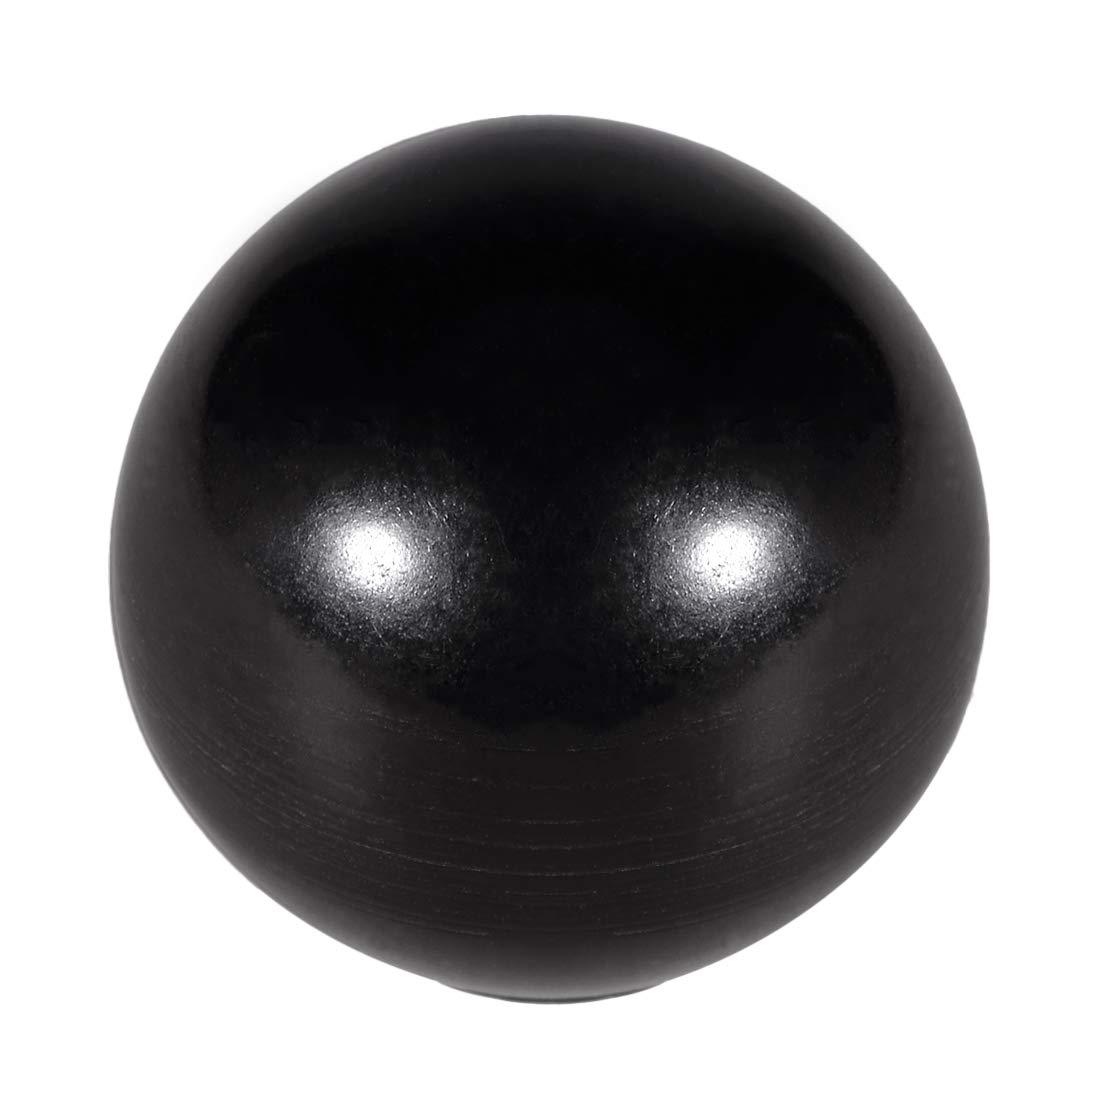 uxcell 15 Pcs Thermoset Ball Knob M5 Female Thread Machine Handle 16mm Diameter Smooth Rim Black